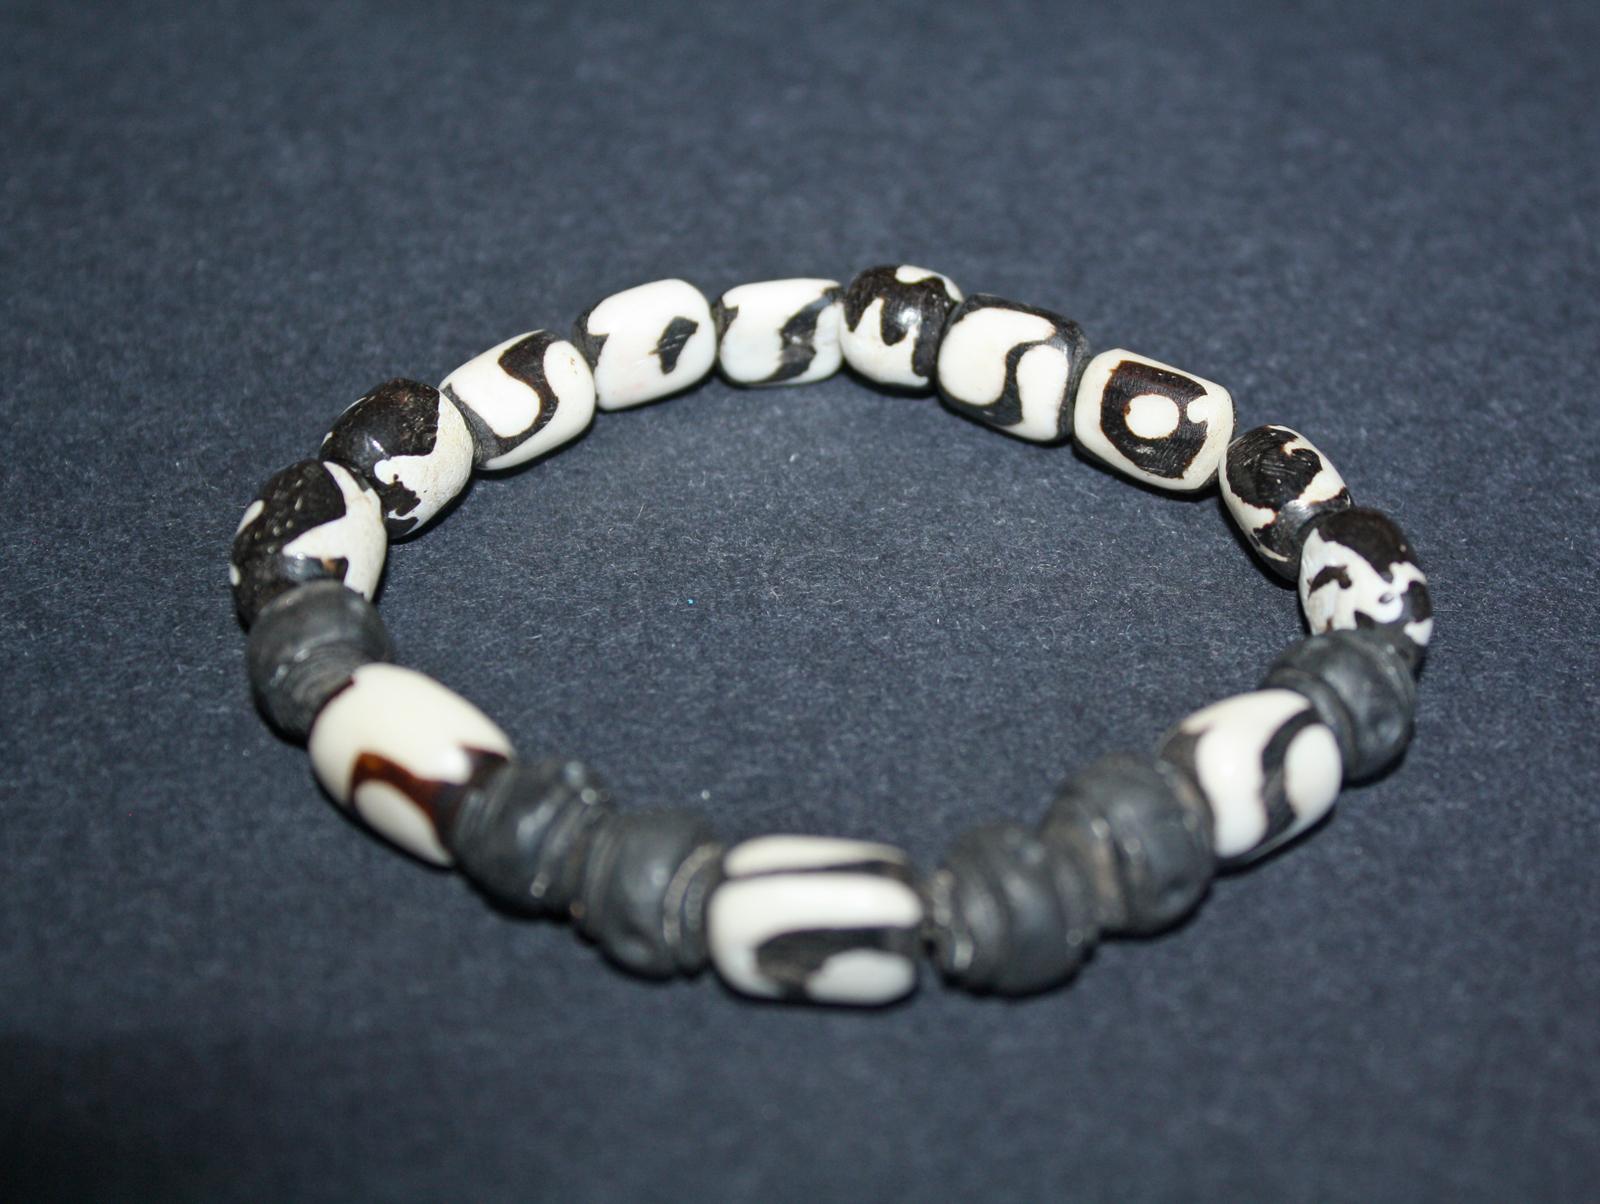 Mens-bone-and-clay-stretchy-bracelet-2